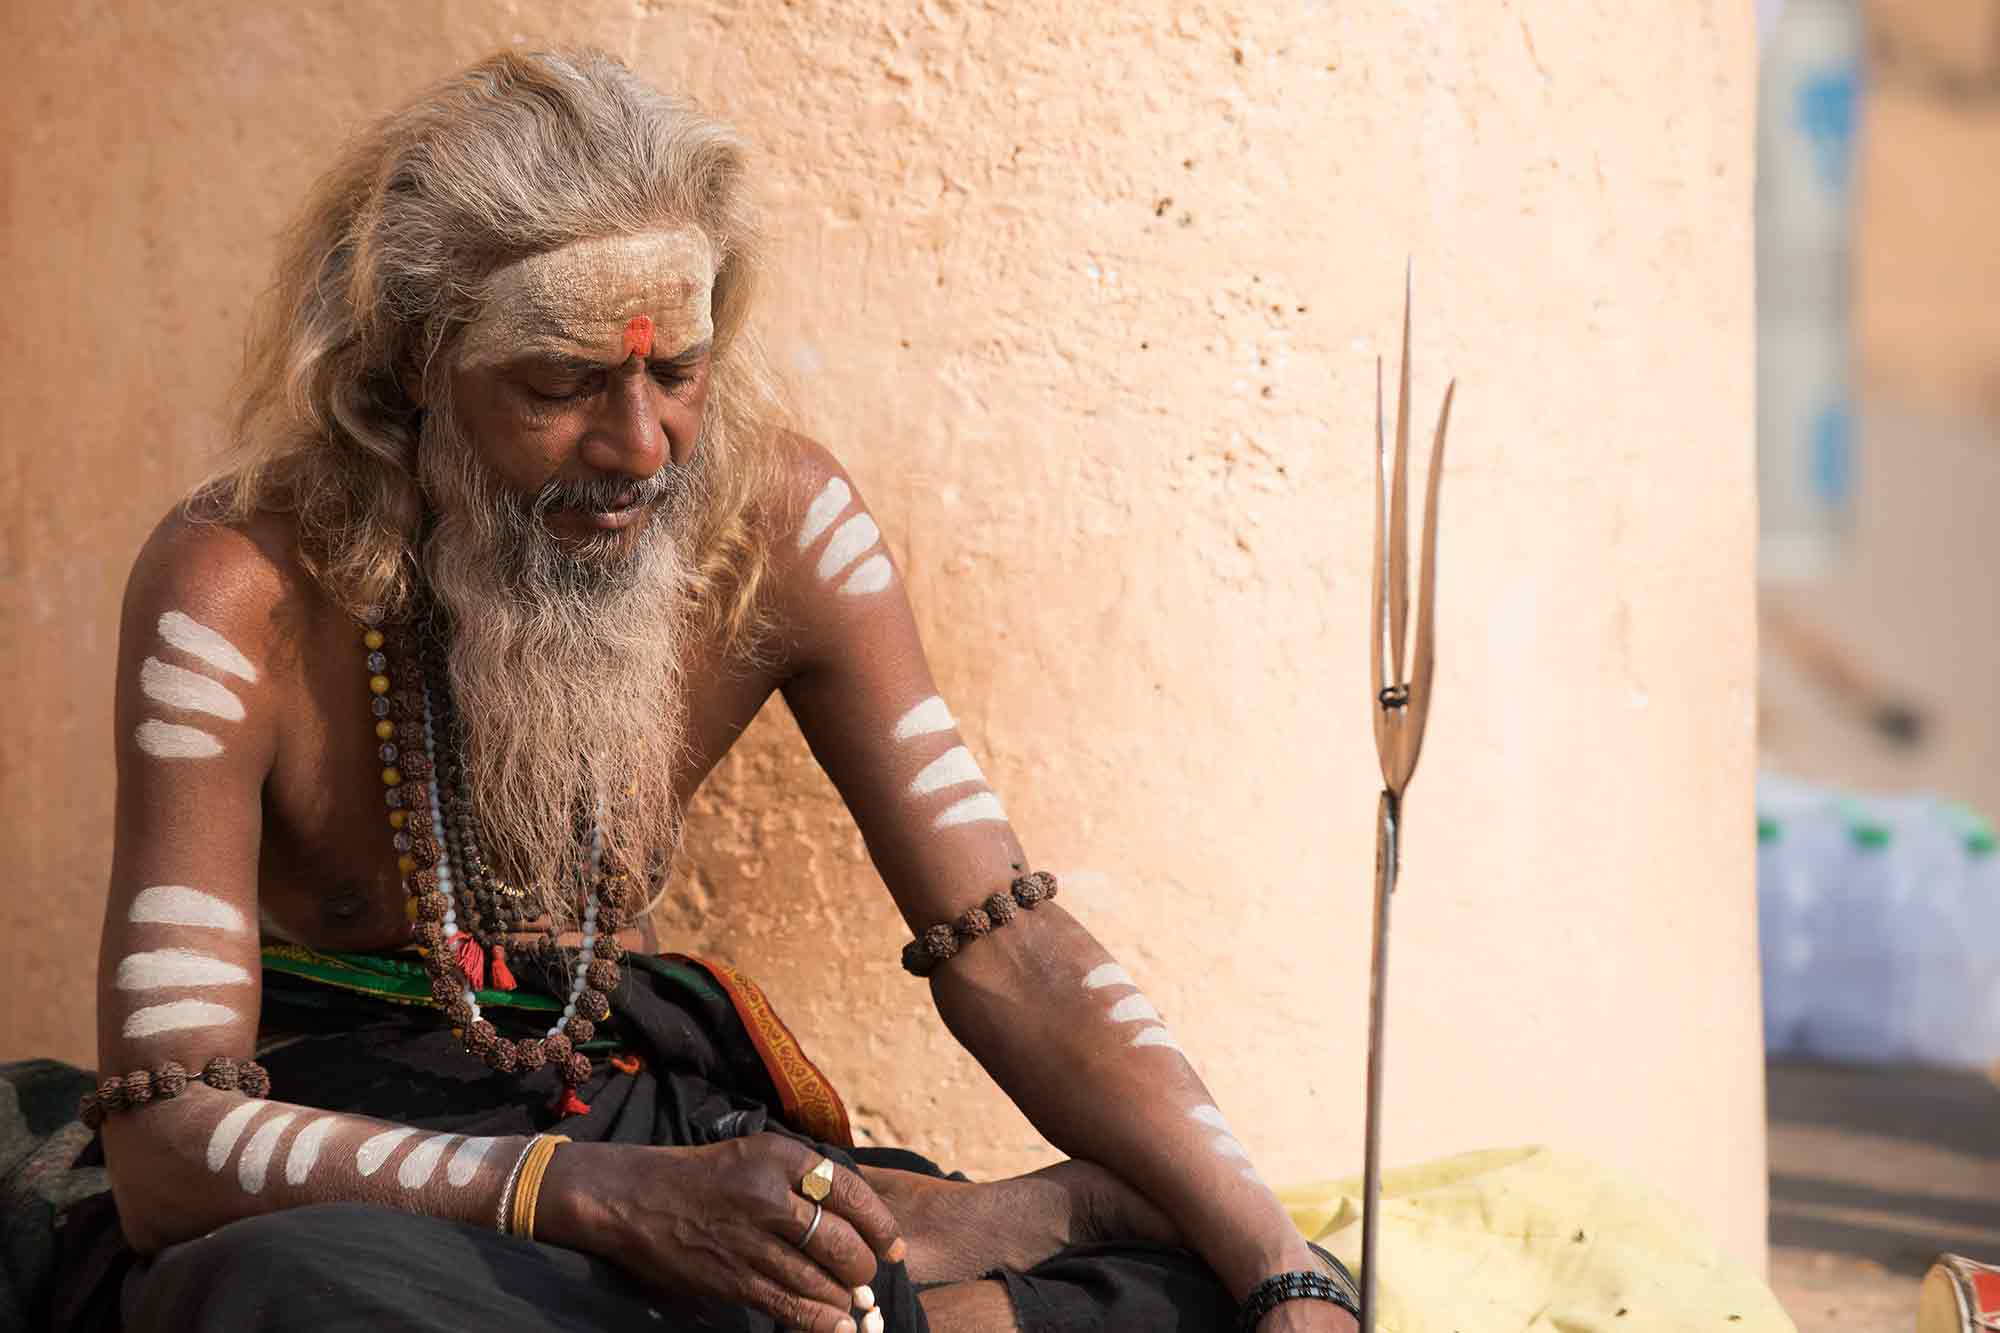 sadhu-varanasi-india-1